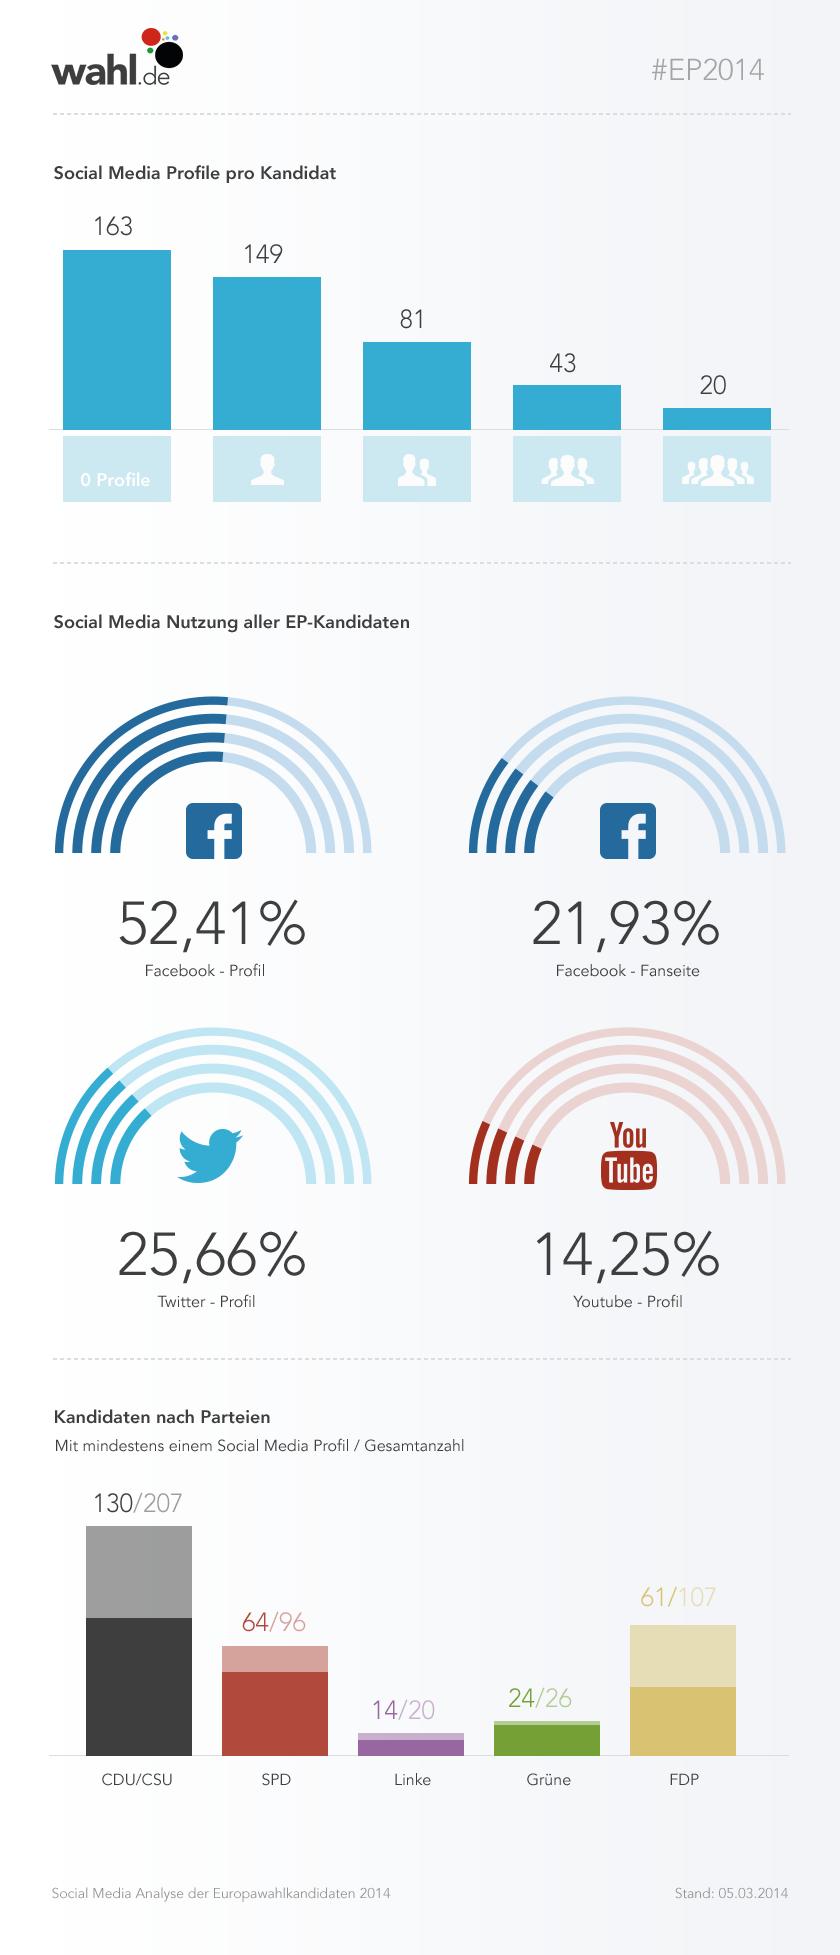 Social Media Profile der Kandidaten (Quelle: Sebastian Schmidtsdorf wahl.de-Blog, CC-BY-SA 3.0)